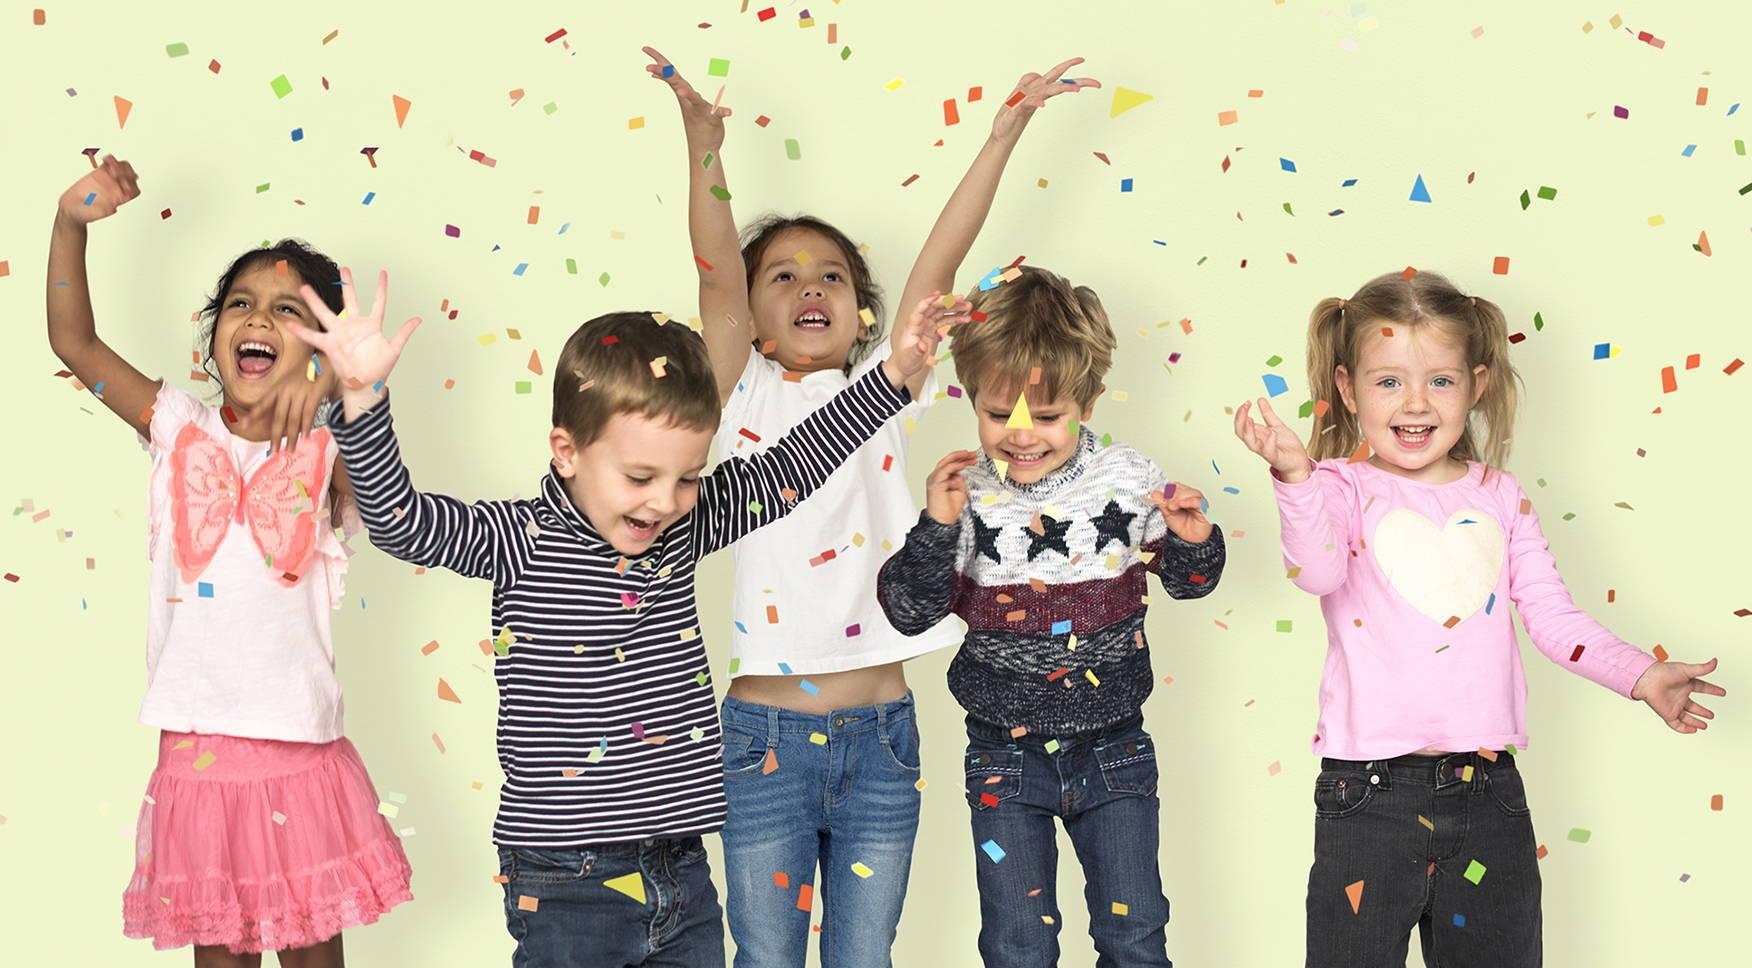 Happy Children Celebrating